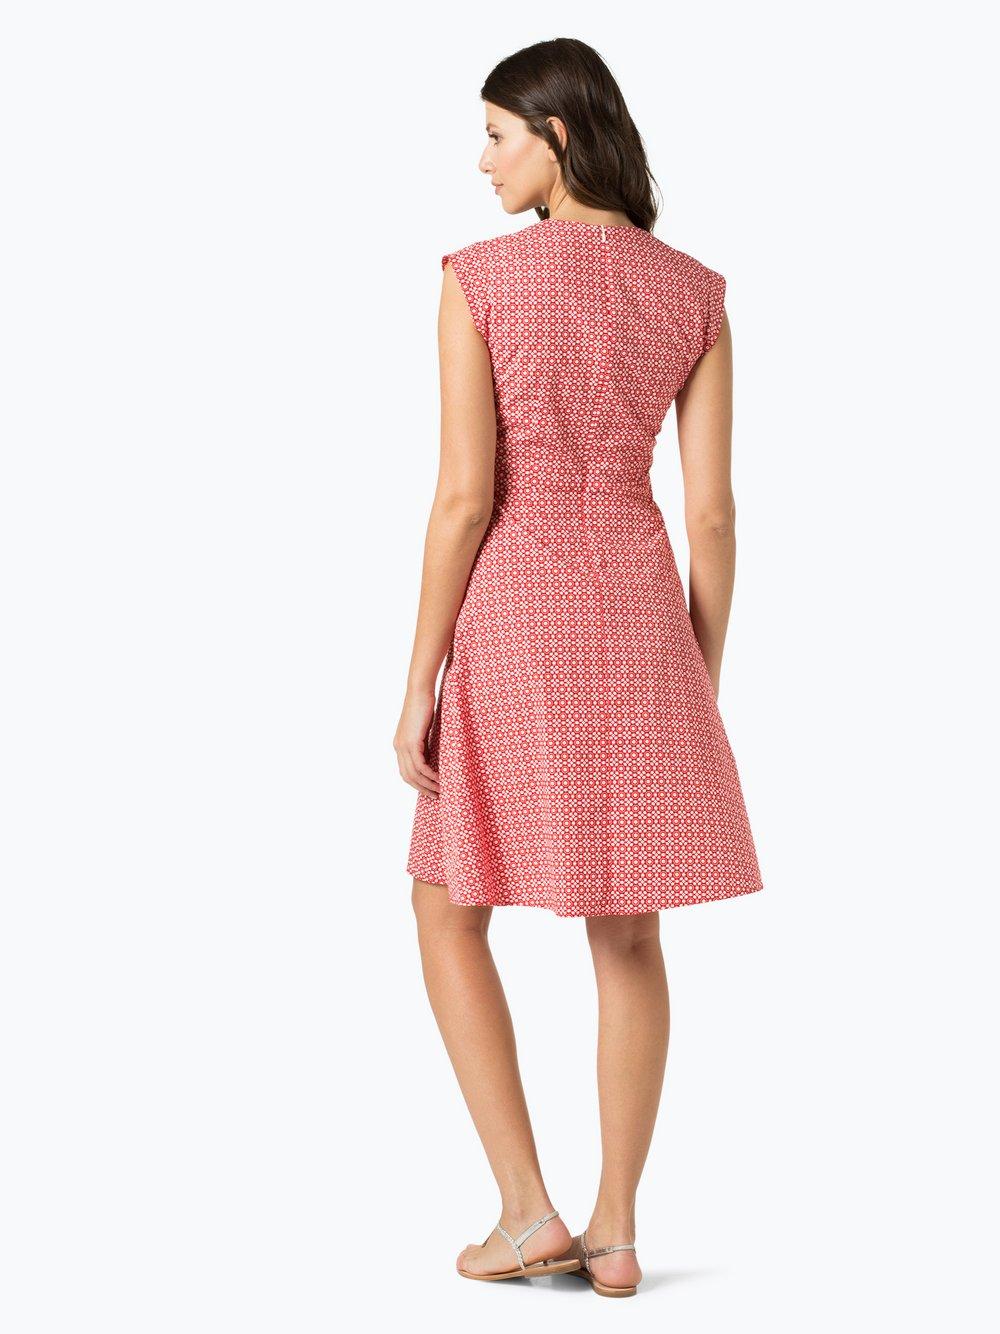 low priced 62315 b3863 Marc O'Polo Damen Kleid online kaufen | VANGRAAF.COM